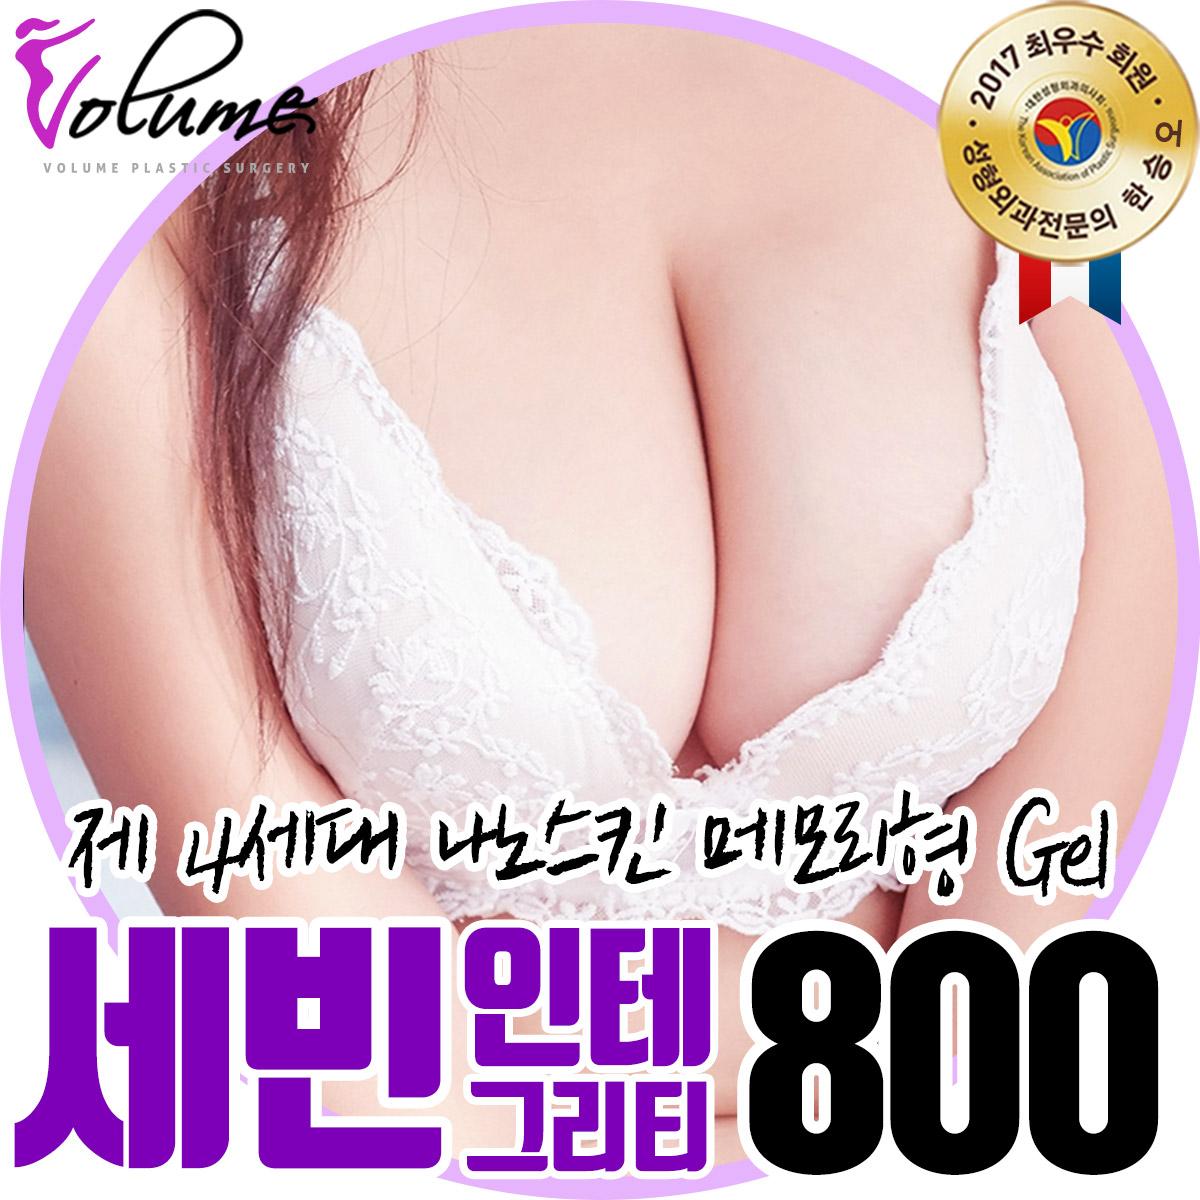 35de65a41be92e677ecb6d3717f16304